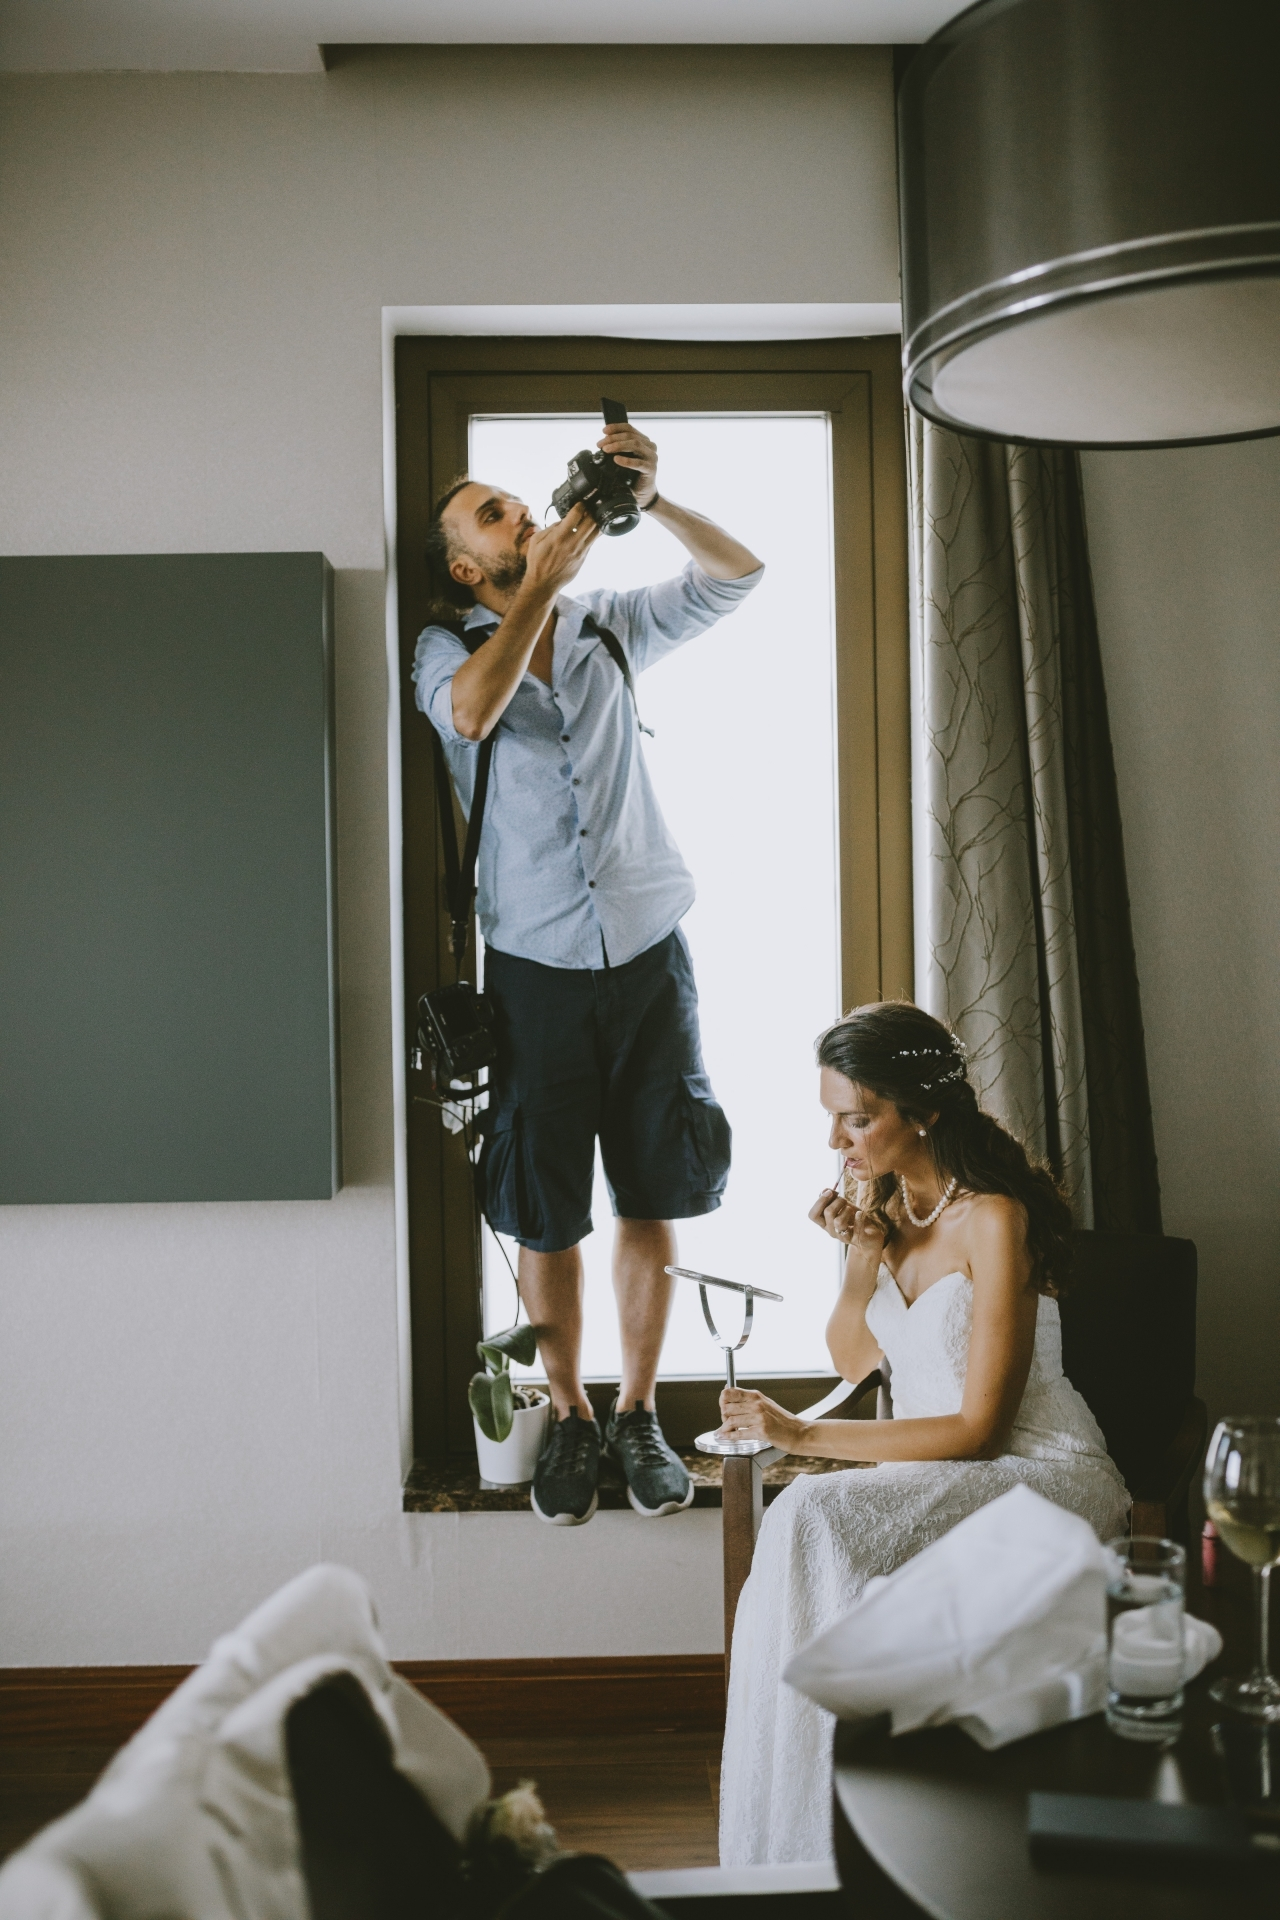 İstanbul攝影師在與新娘的婚禮上工作。